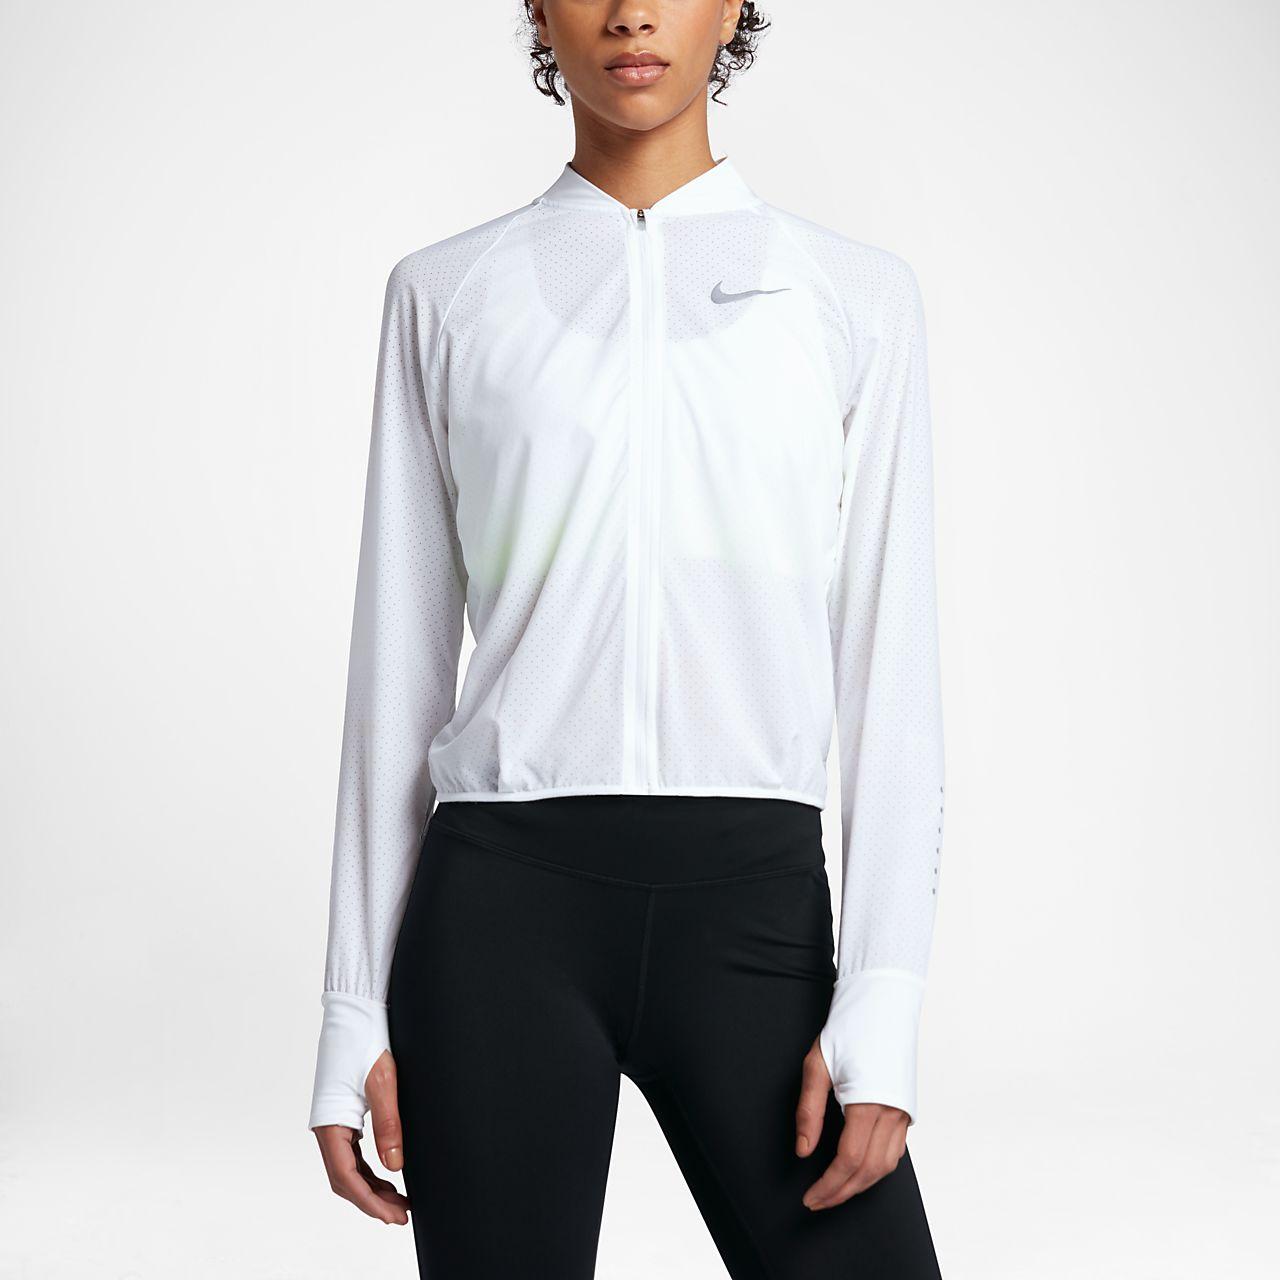 Nike running jacket women's